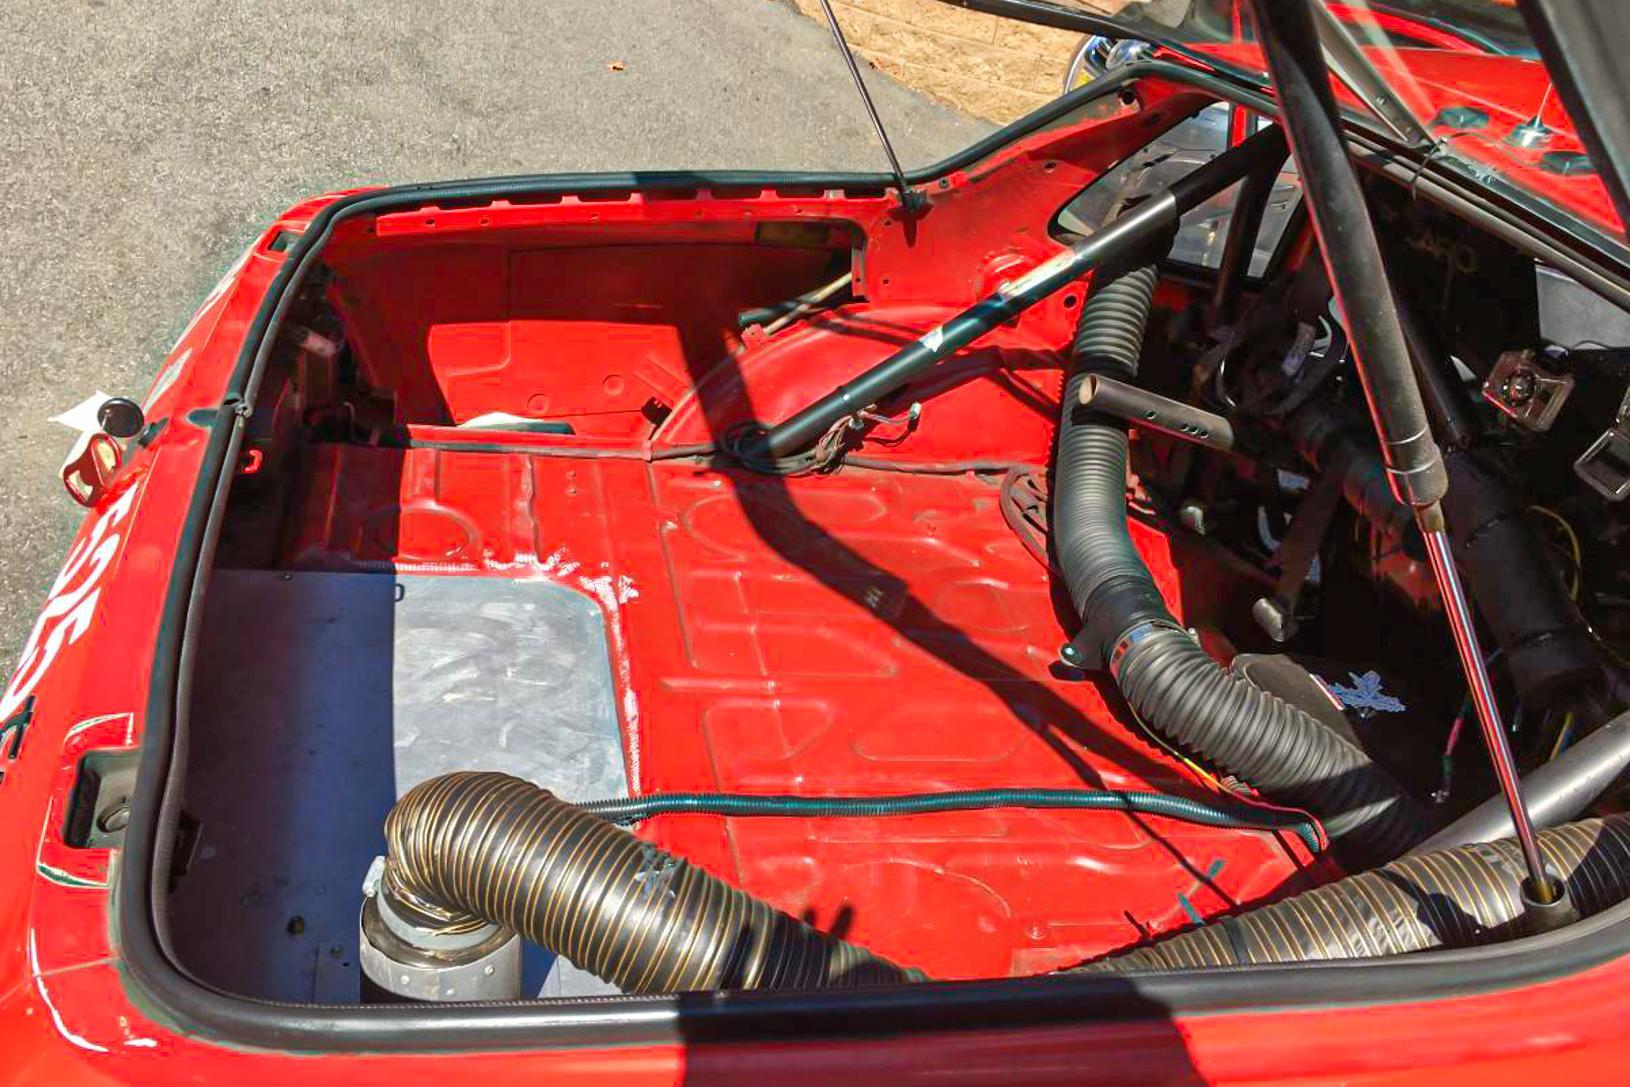 1987 944 Turbo S 'Track Car'